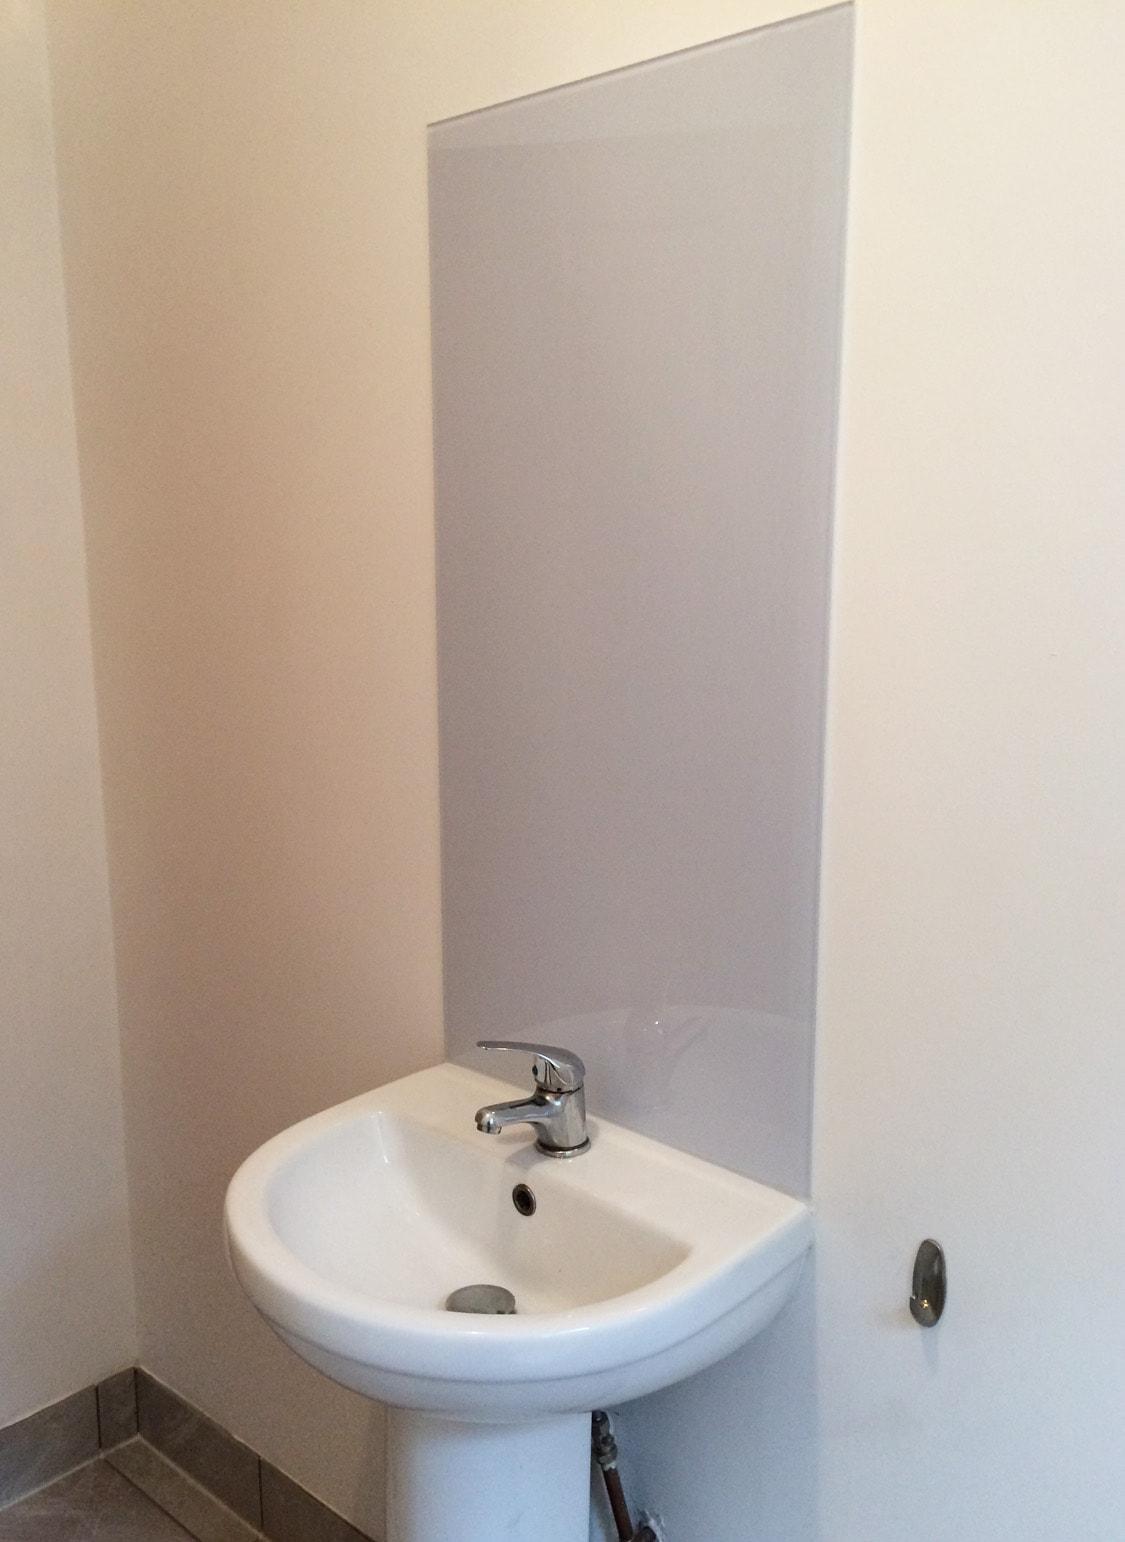 Cloud Glass Splashback Behind Bathroom Sink. Cloud Glass Splashback Behind  Bathroom Sink